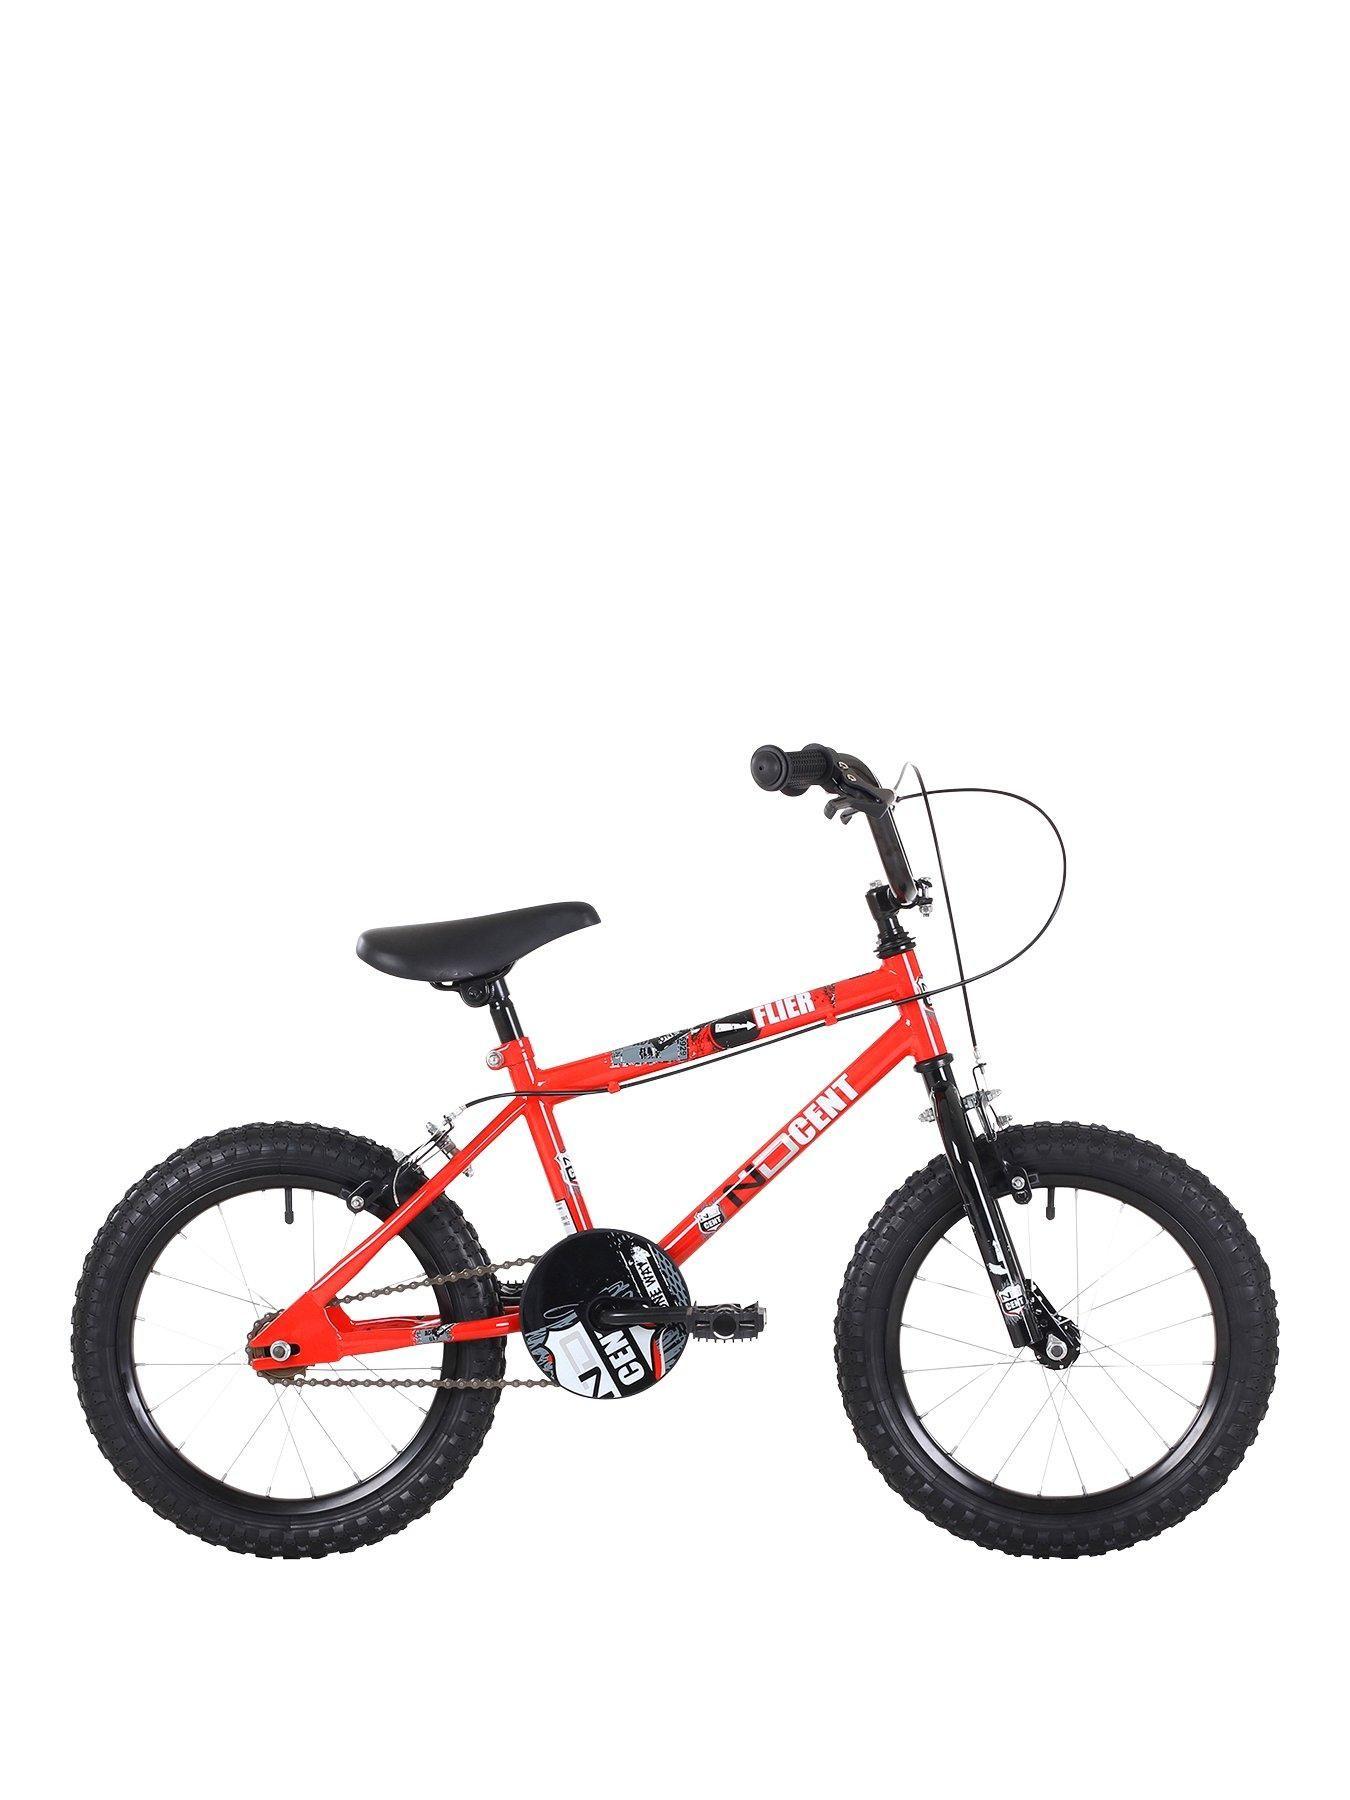 Flier Boys Bmx Bike 10 Inch Frame Products In 2019 Bmx Bikes